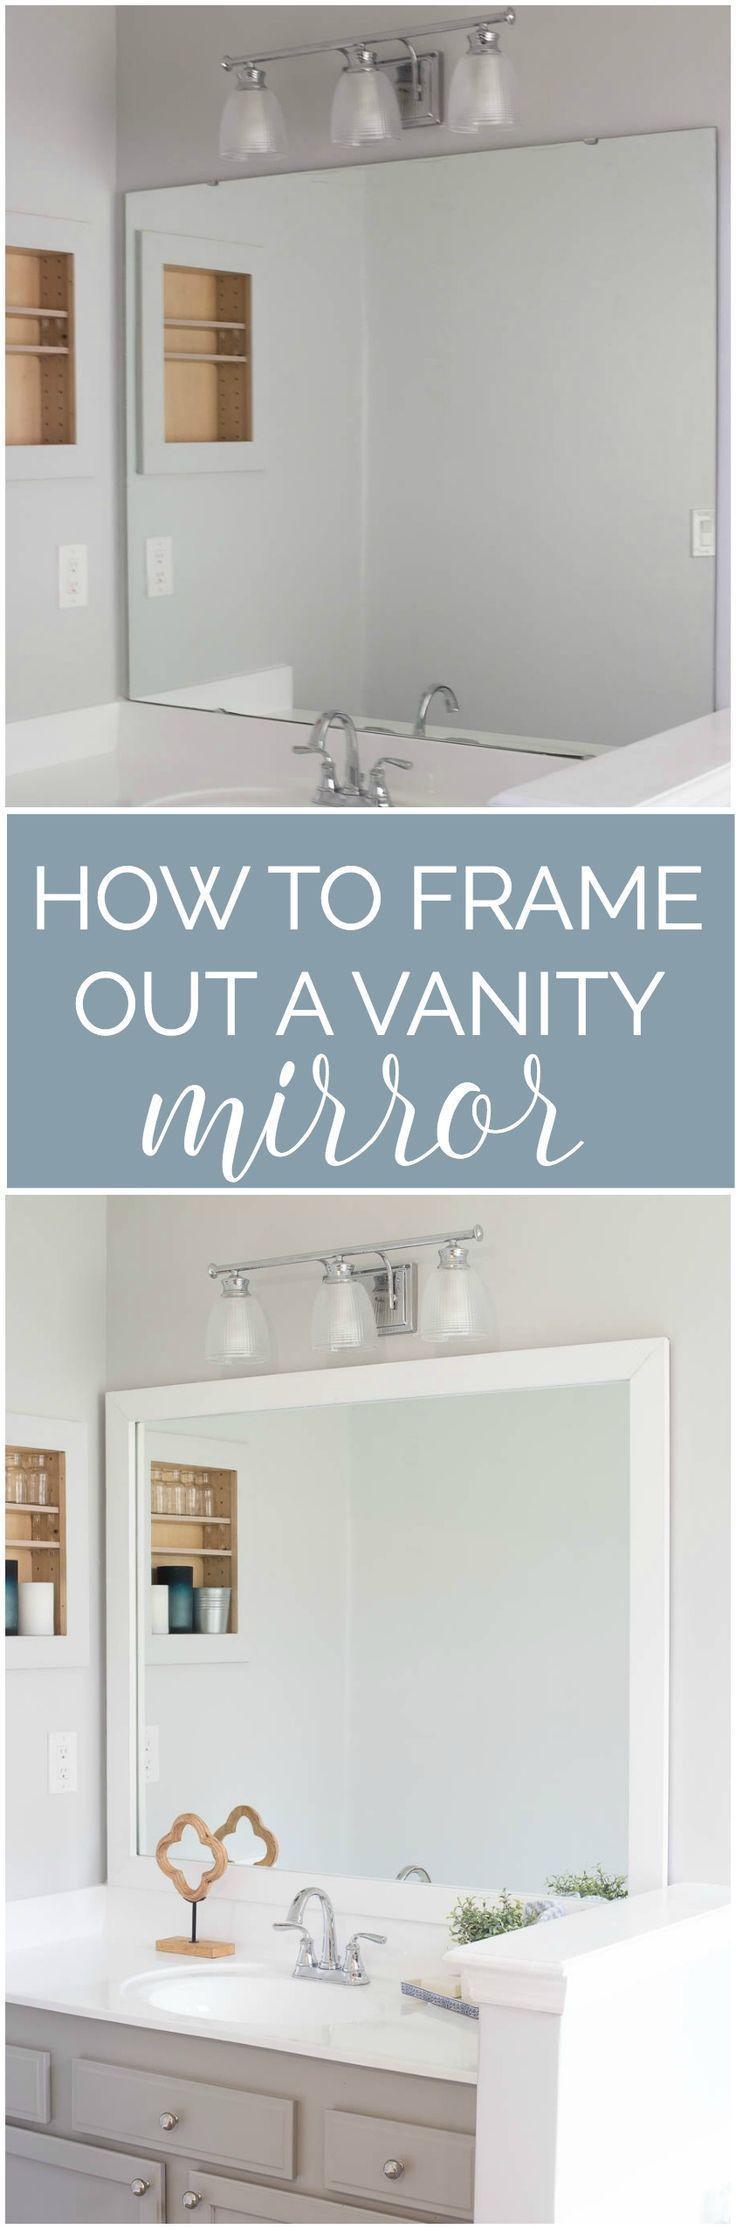 954 best Home Improvement images on Pinterest   Shelf, Anchor ...